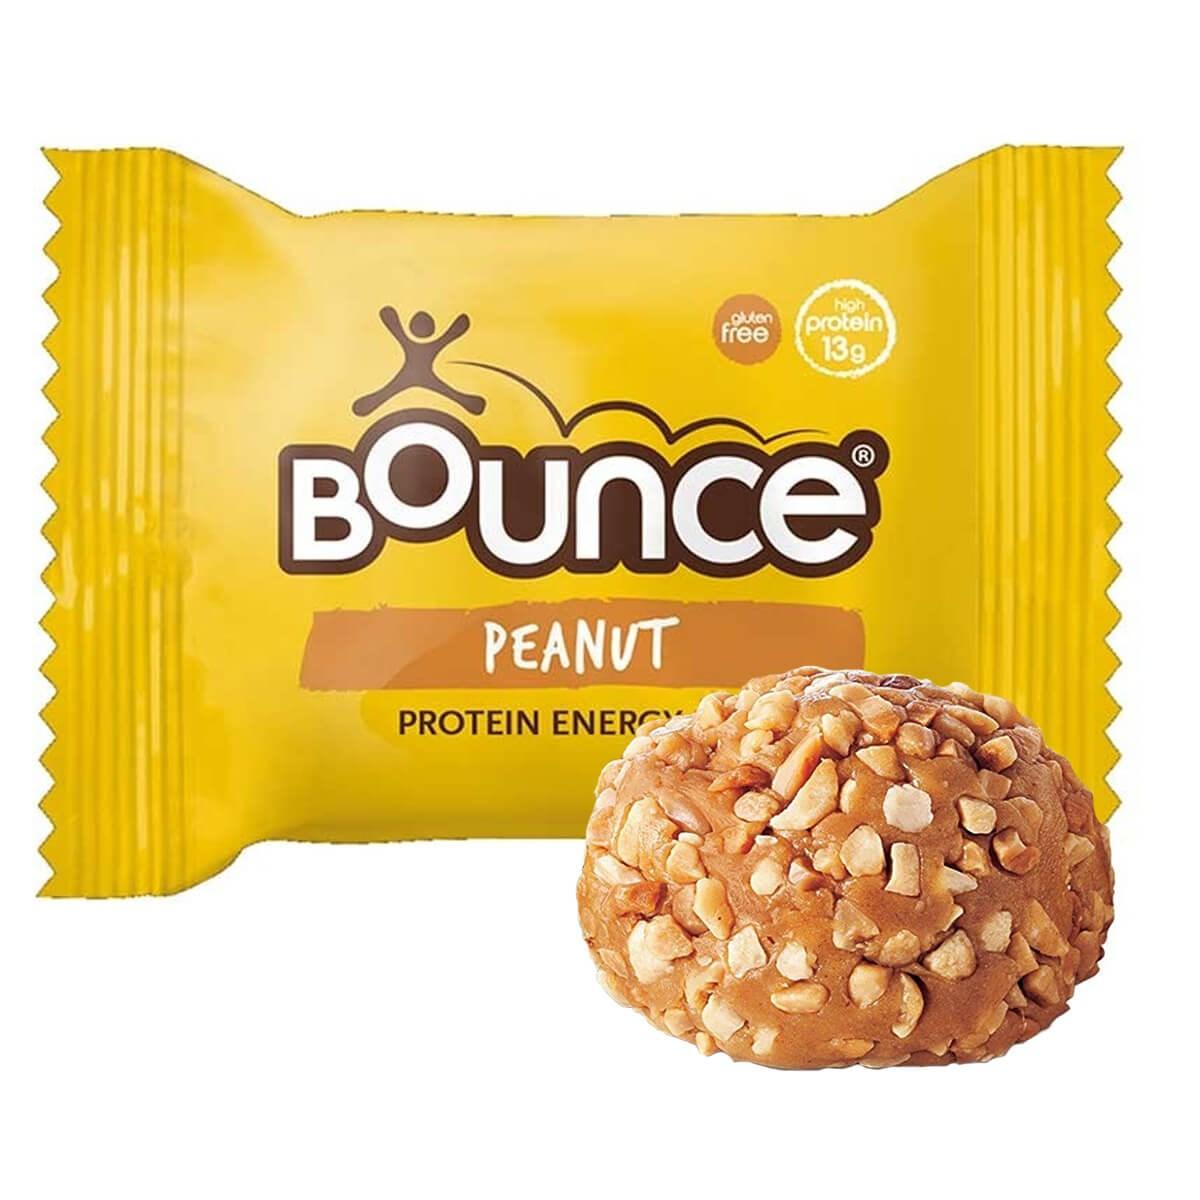 Bounce Peanut Protein Blast